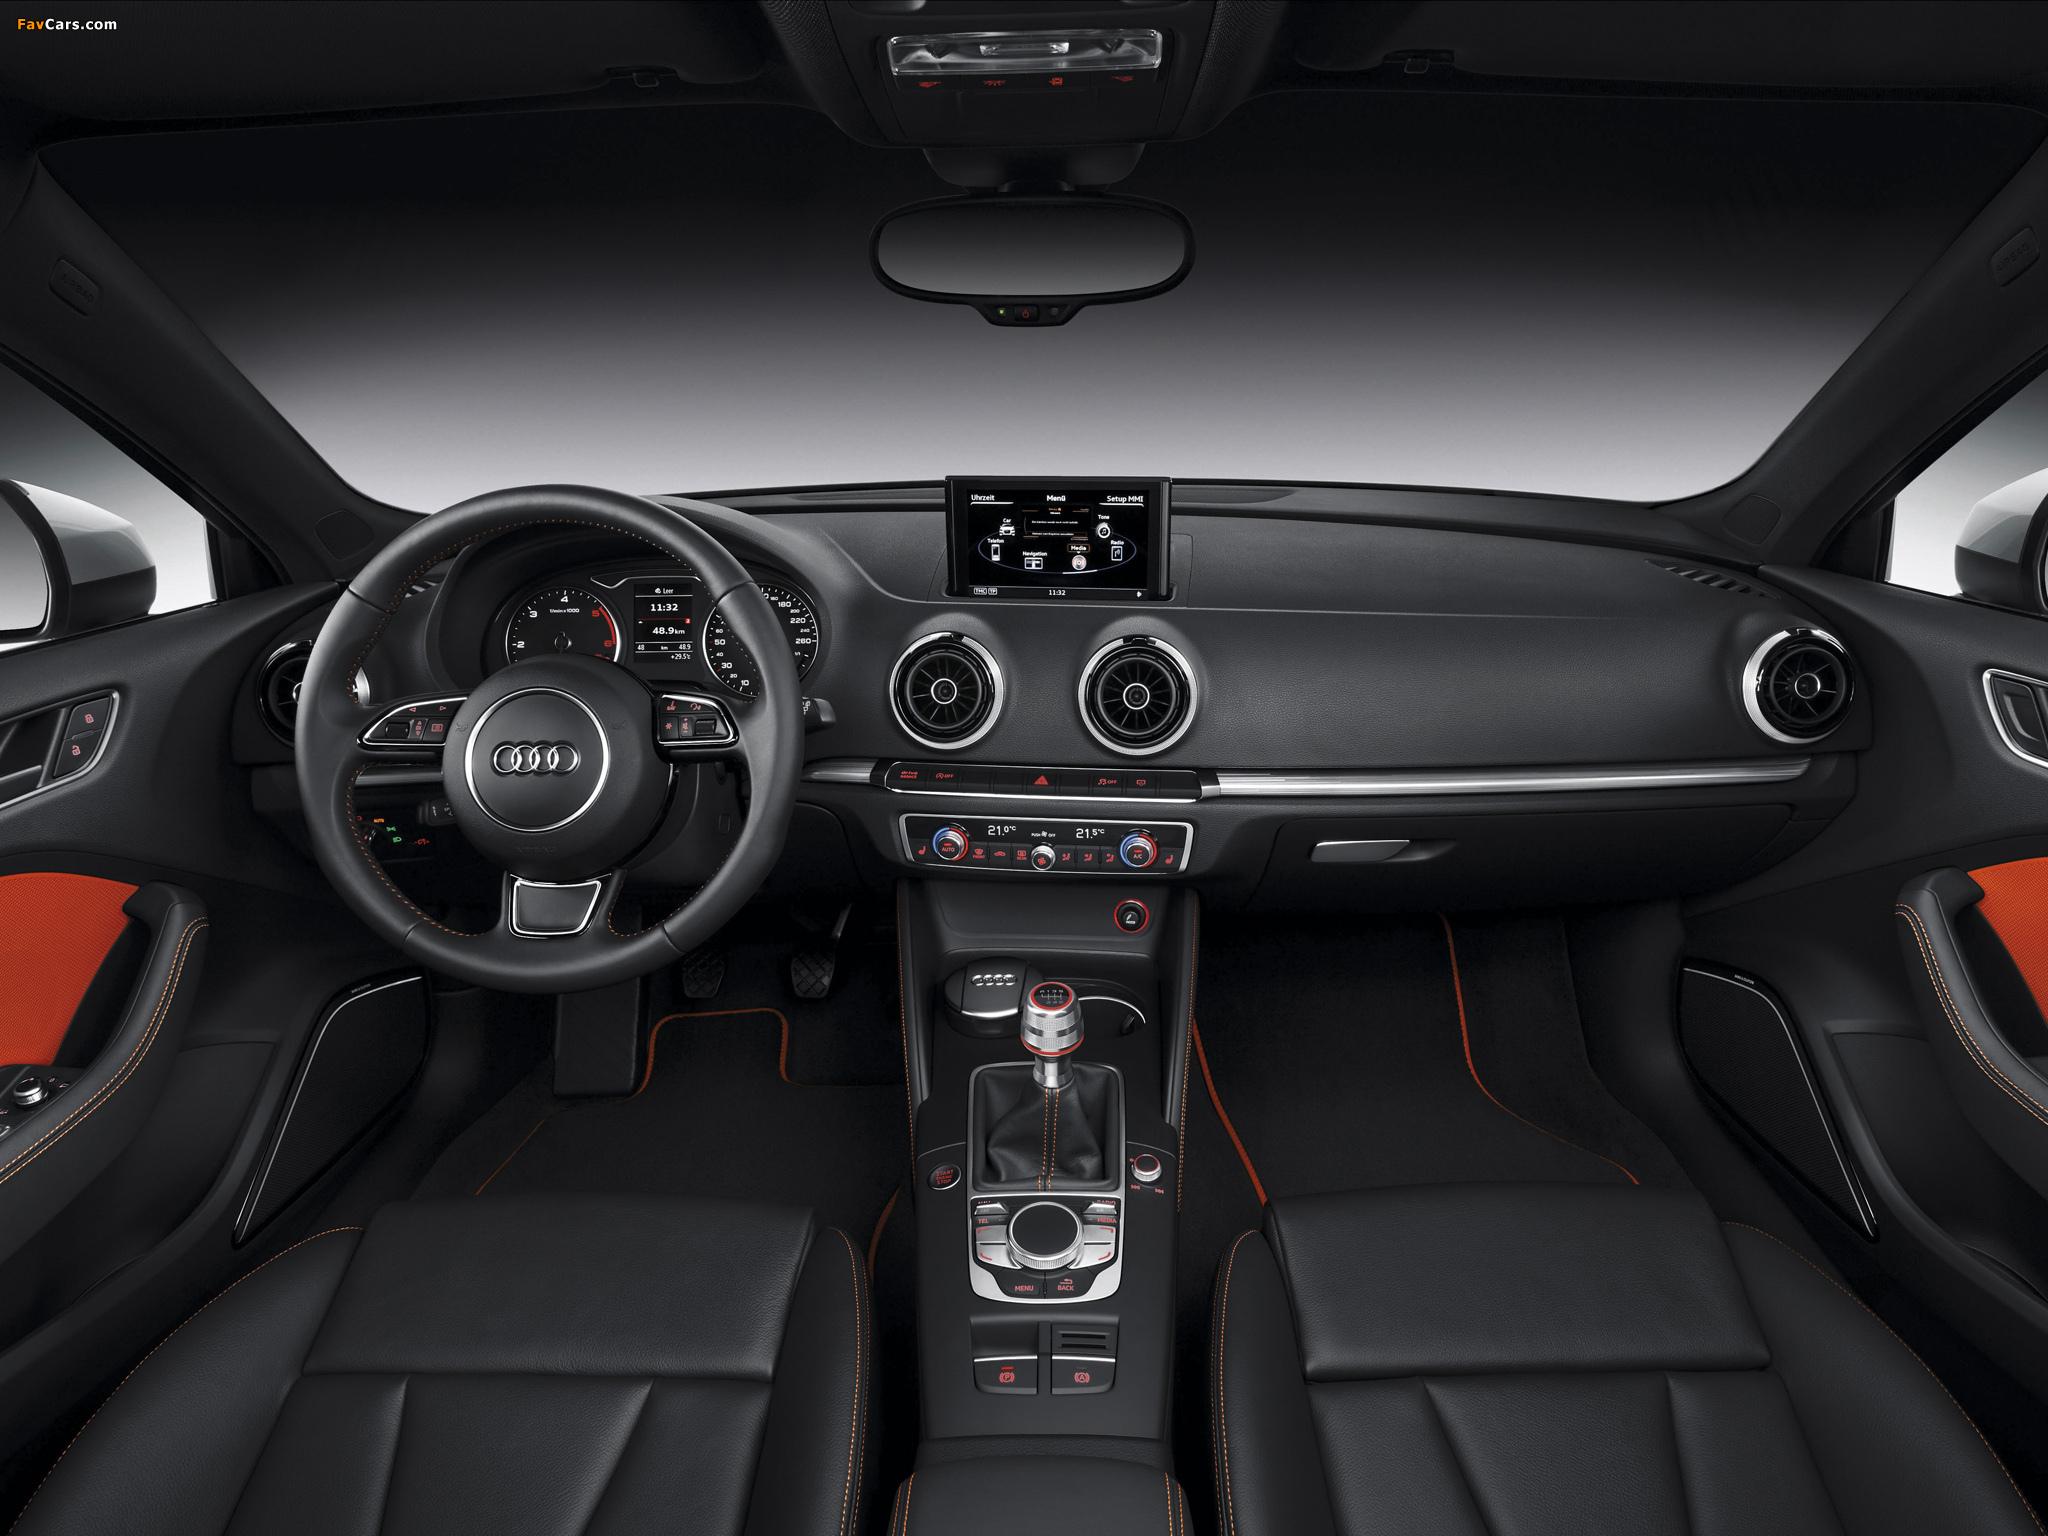 Audi A3 Sportback 2 0 Tdi S Line 8v 2012 Images 2048x1536